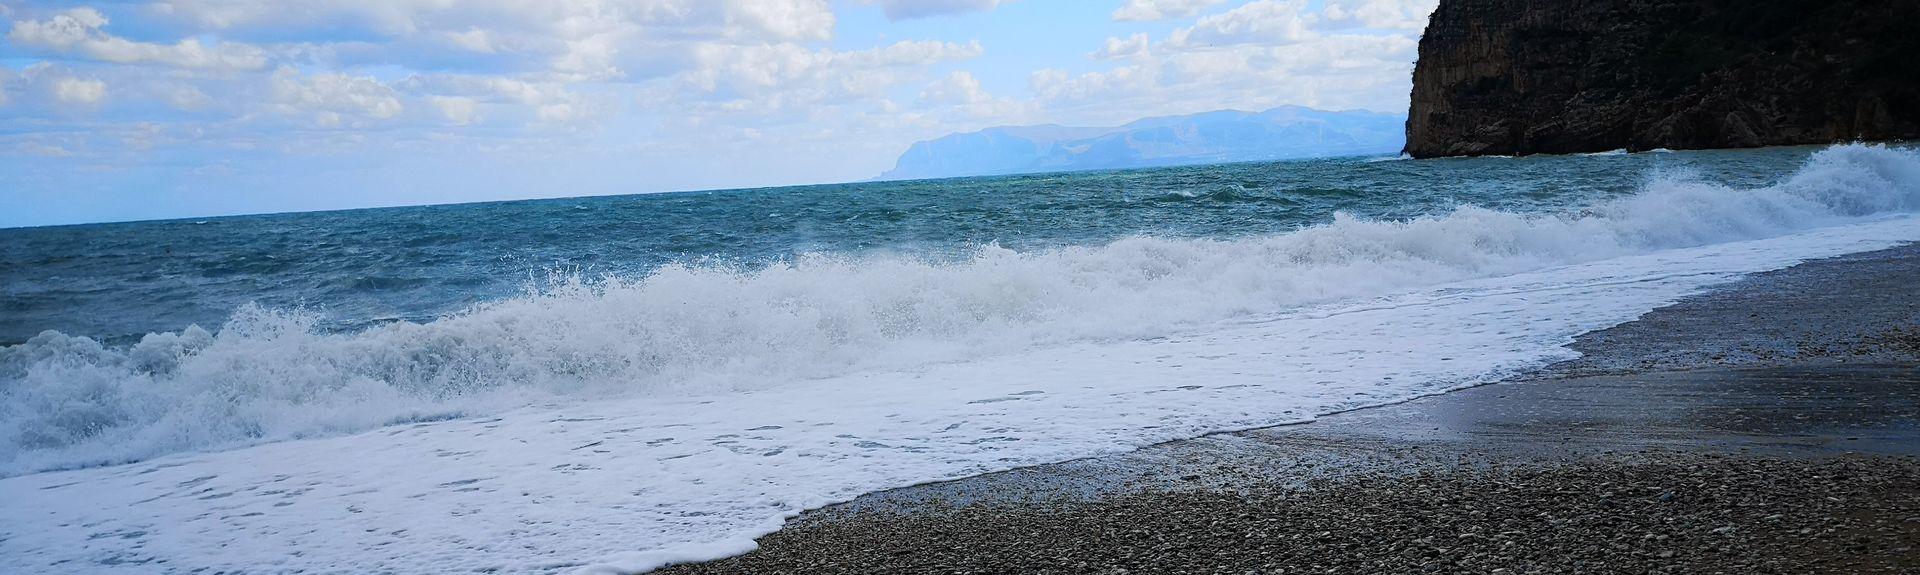 Partinico, Sicilië, Italië